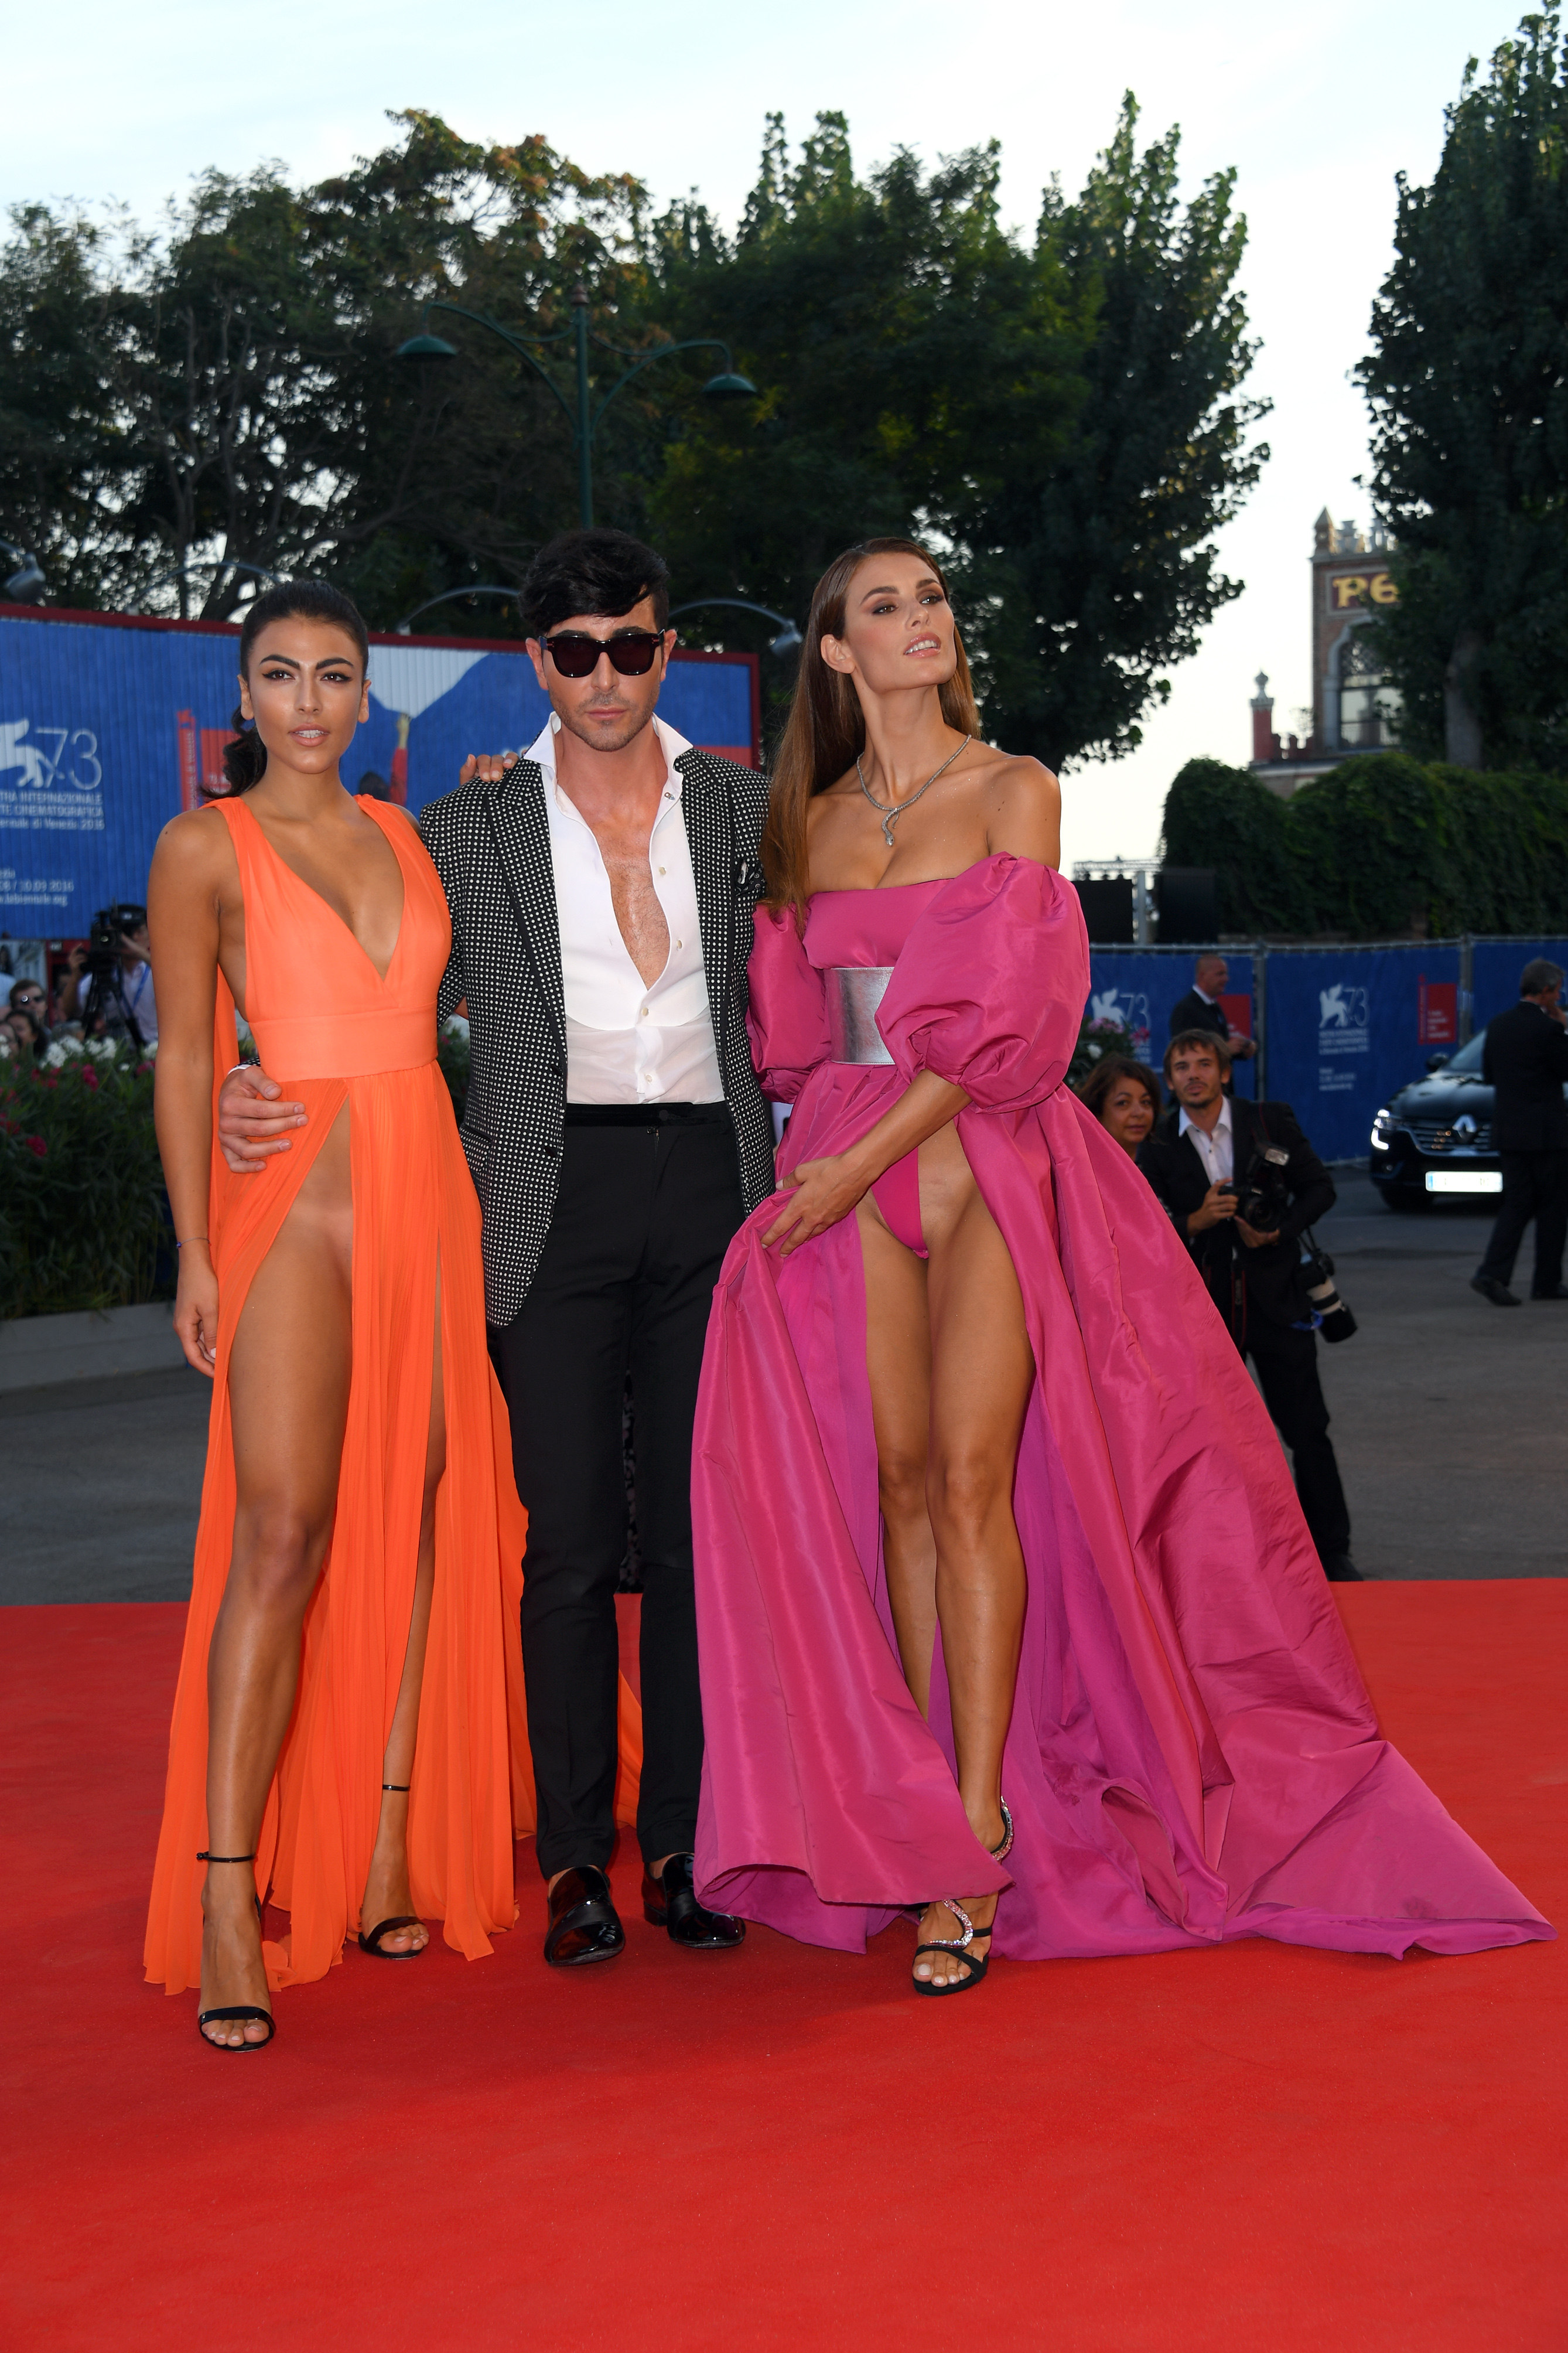 скандал на венецианском фестивале фото